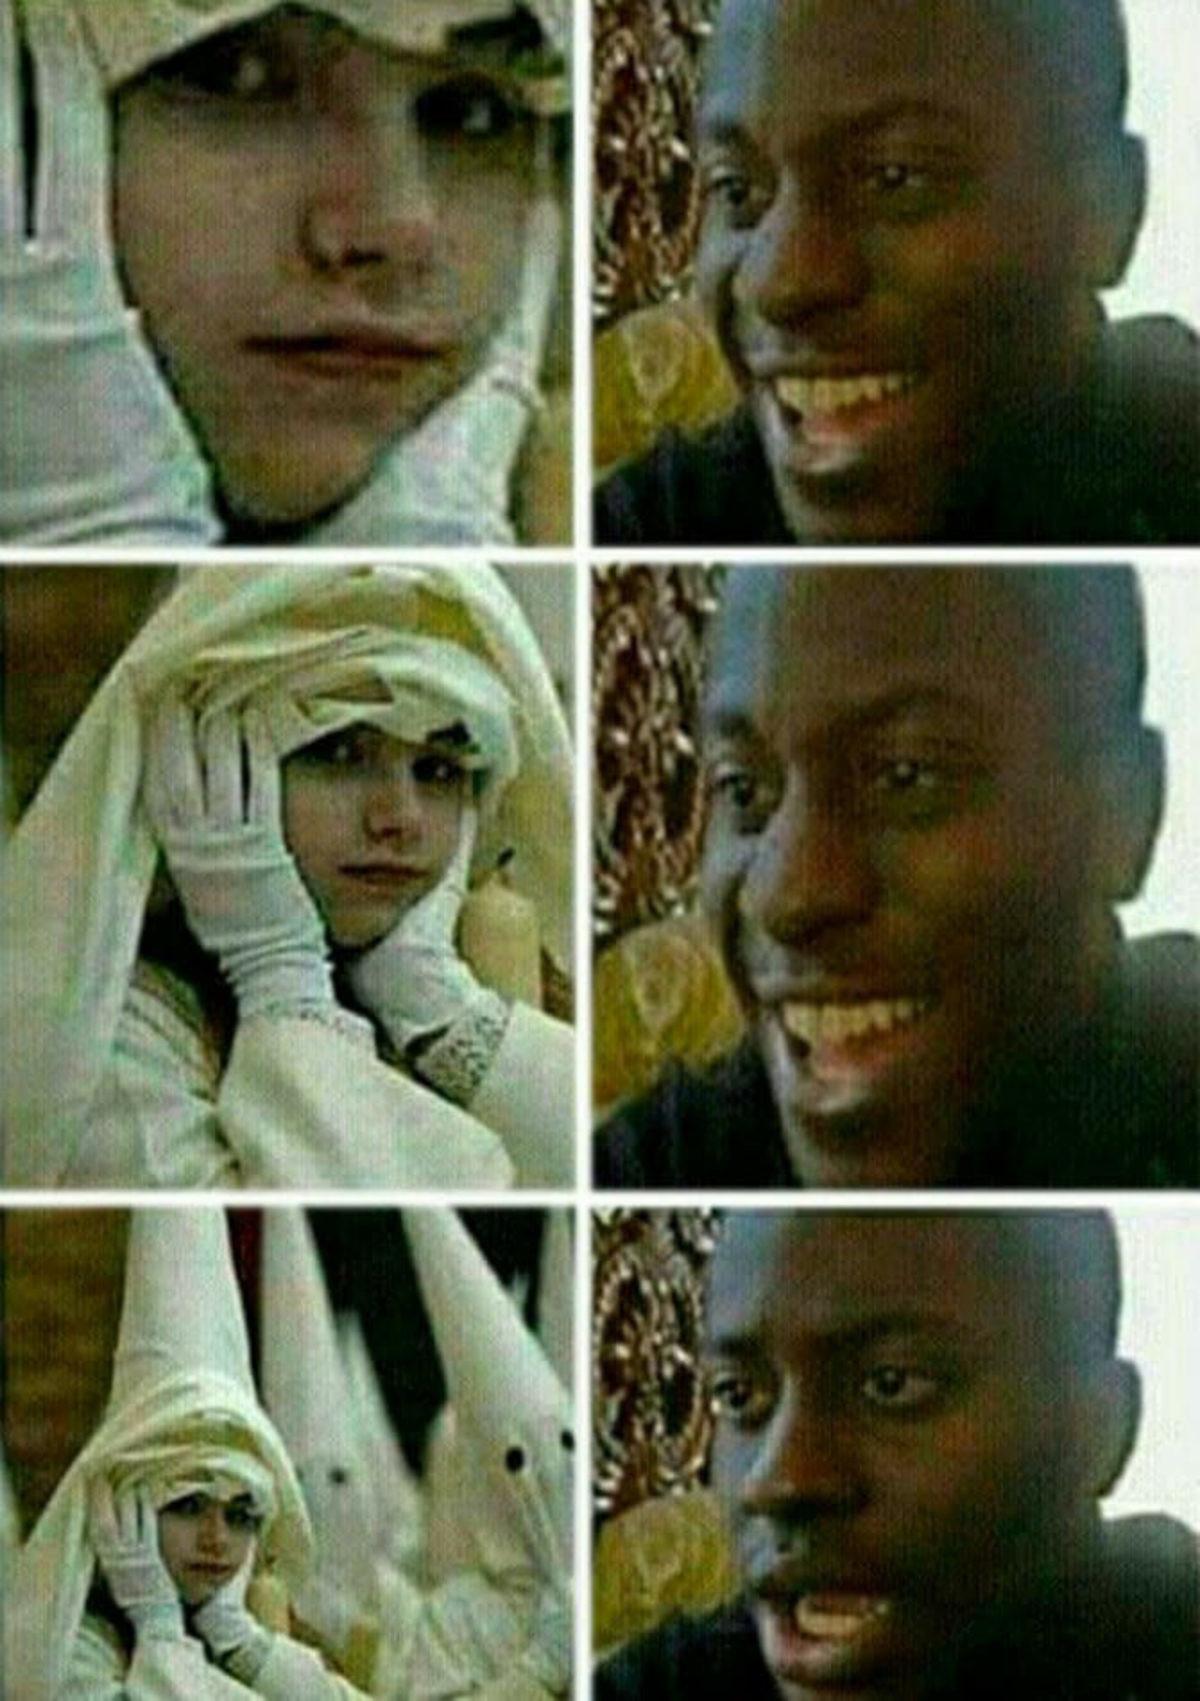 La chica del Ku Klux Klan - meme